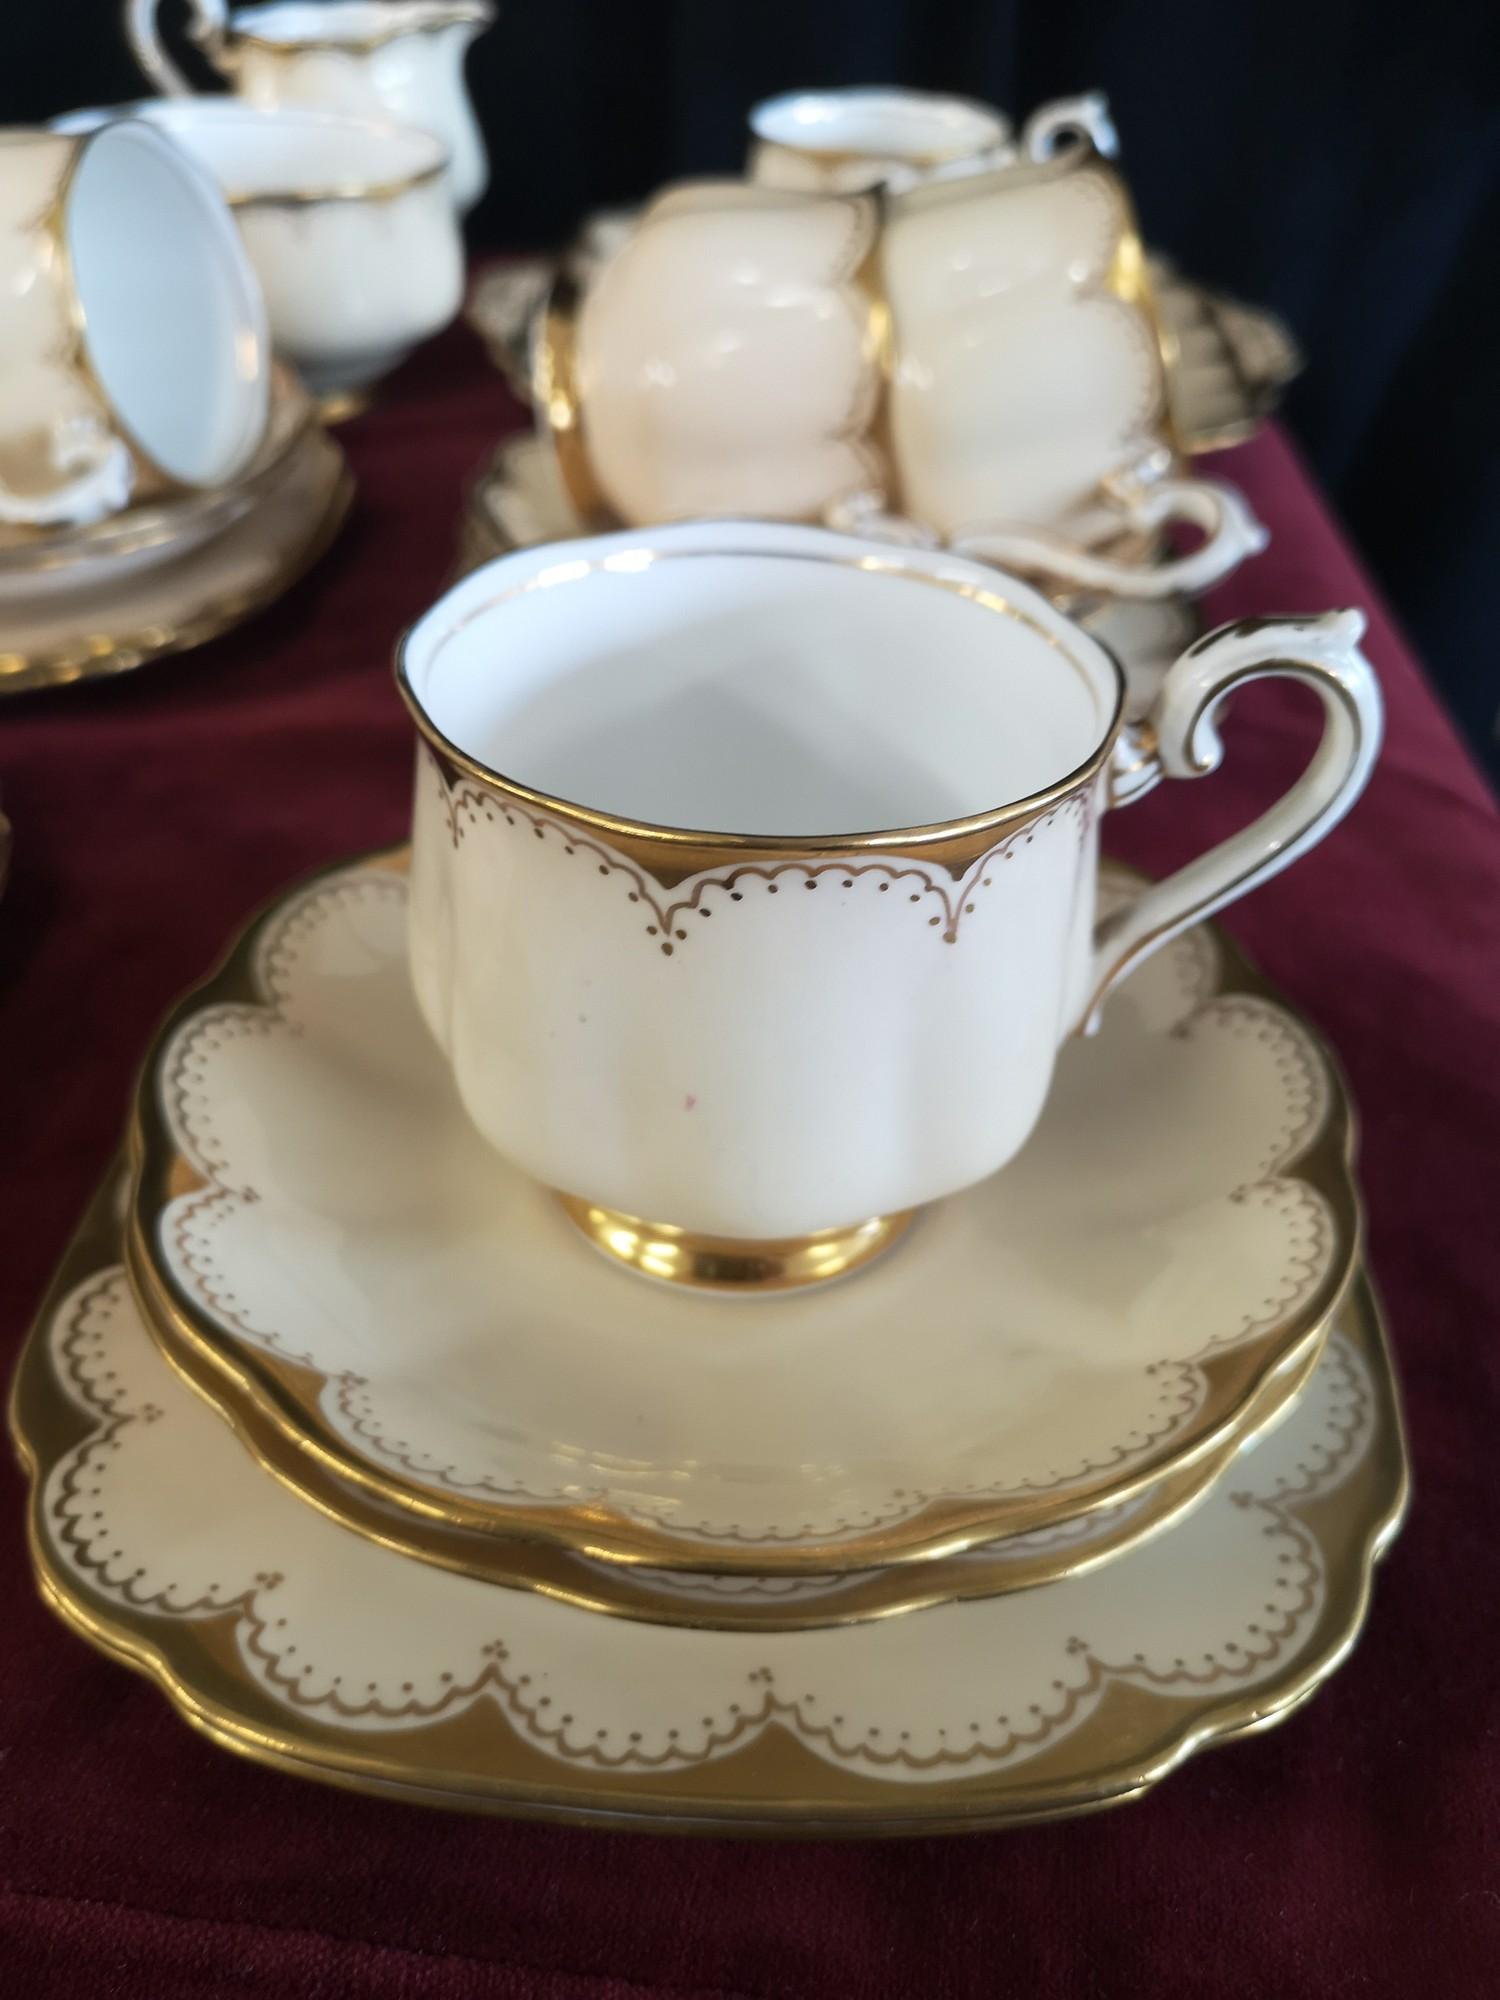 Large 1900s Royal Albert gilt tea set, set in cream back ground. - Image 8 of 10